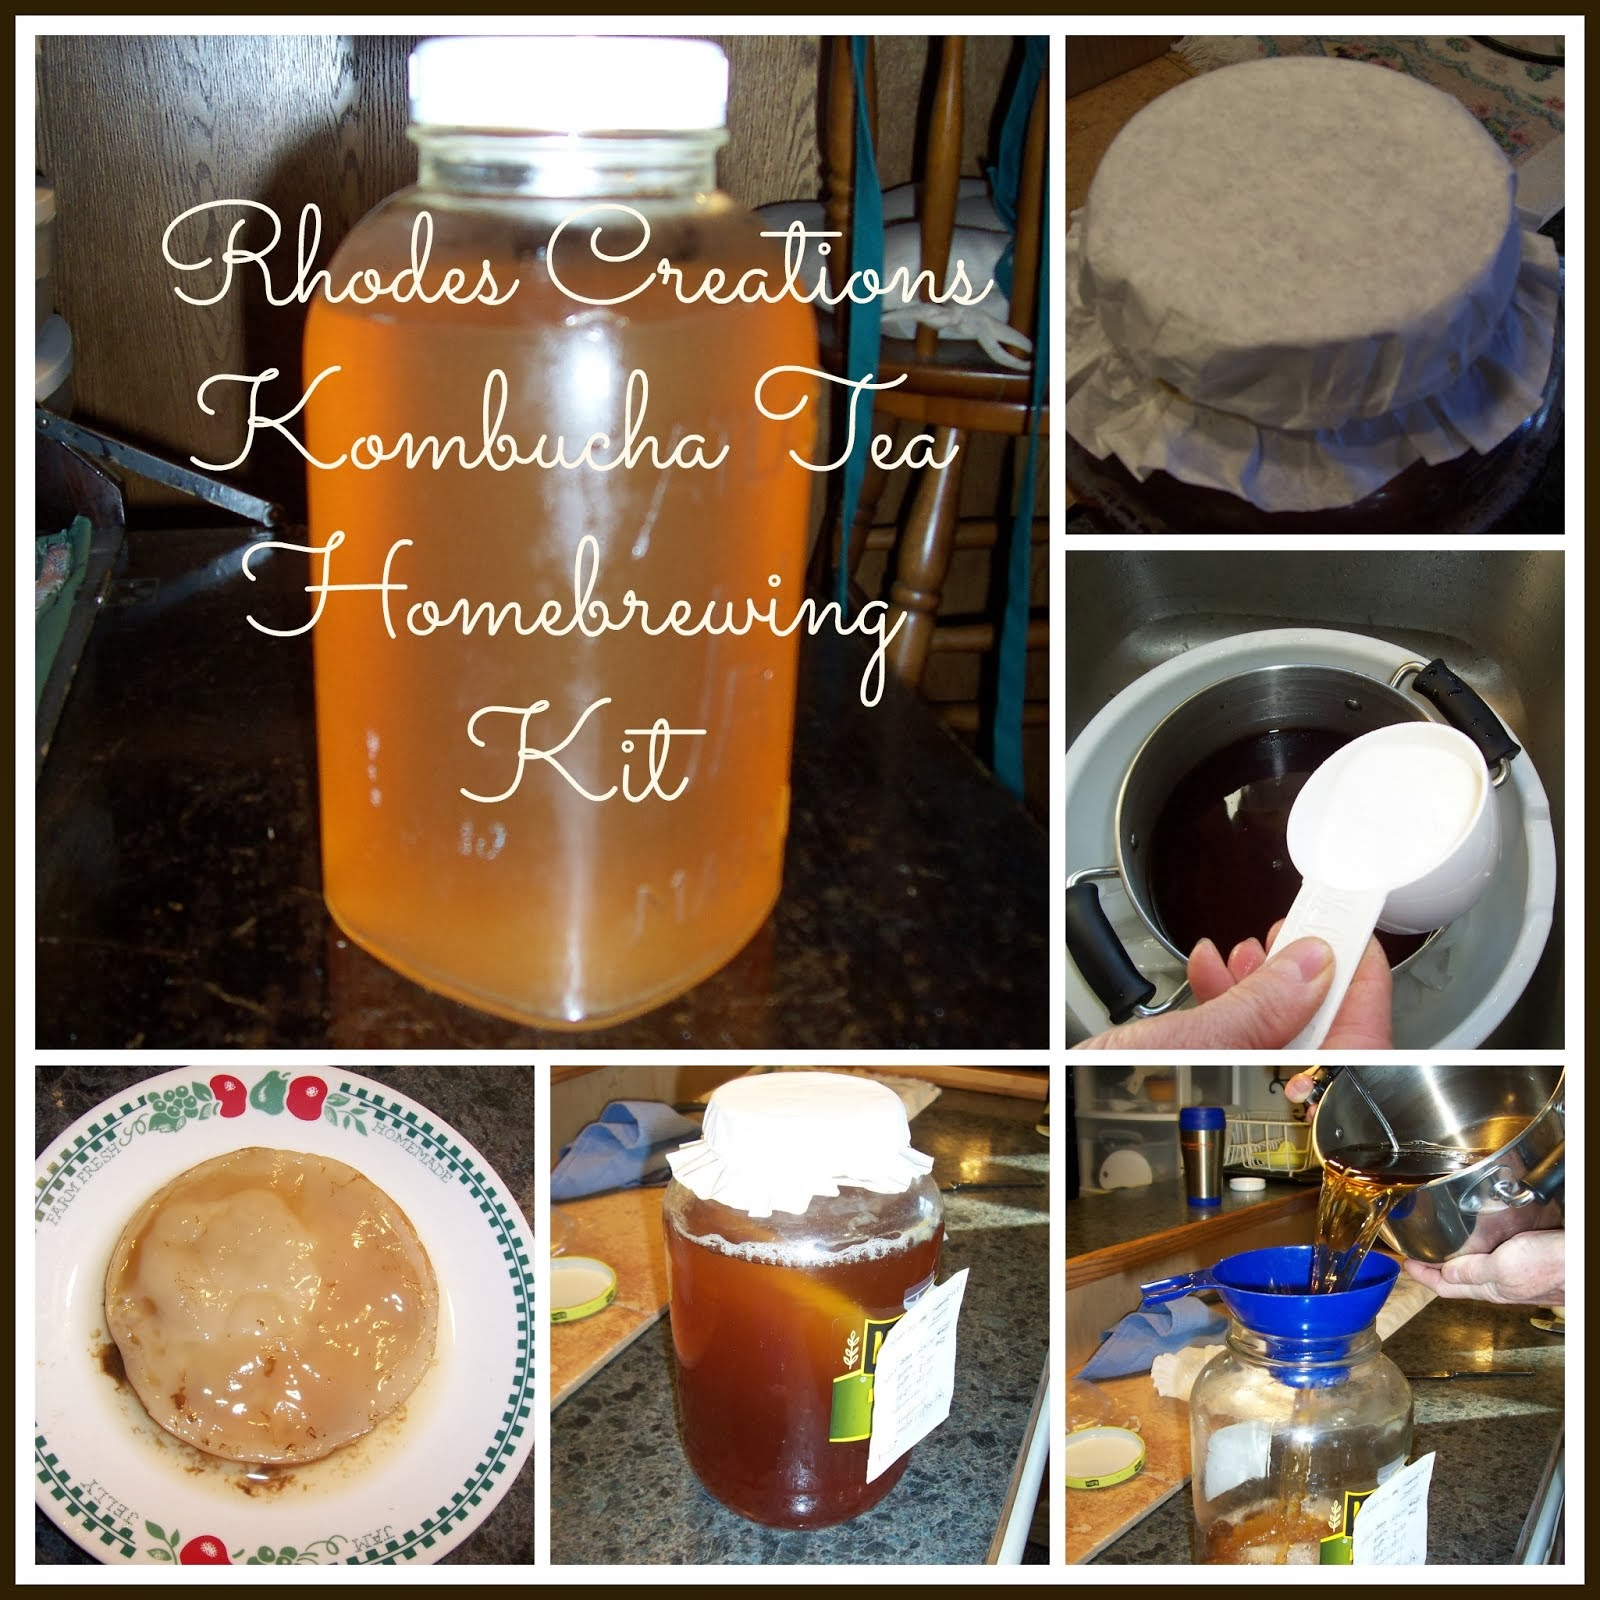 KT Hombrewing Kit